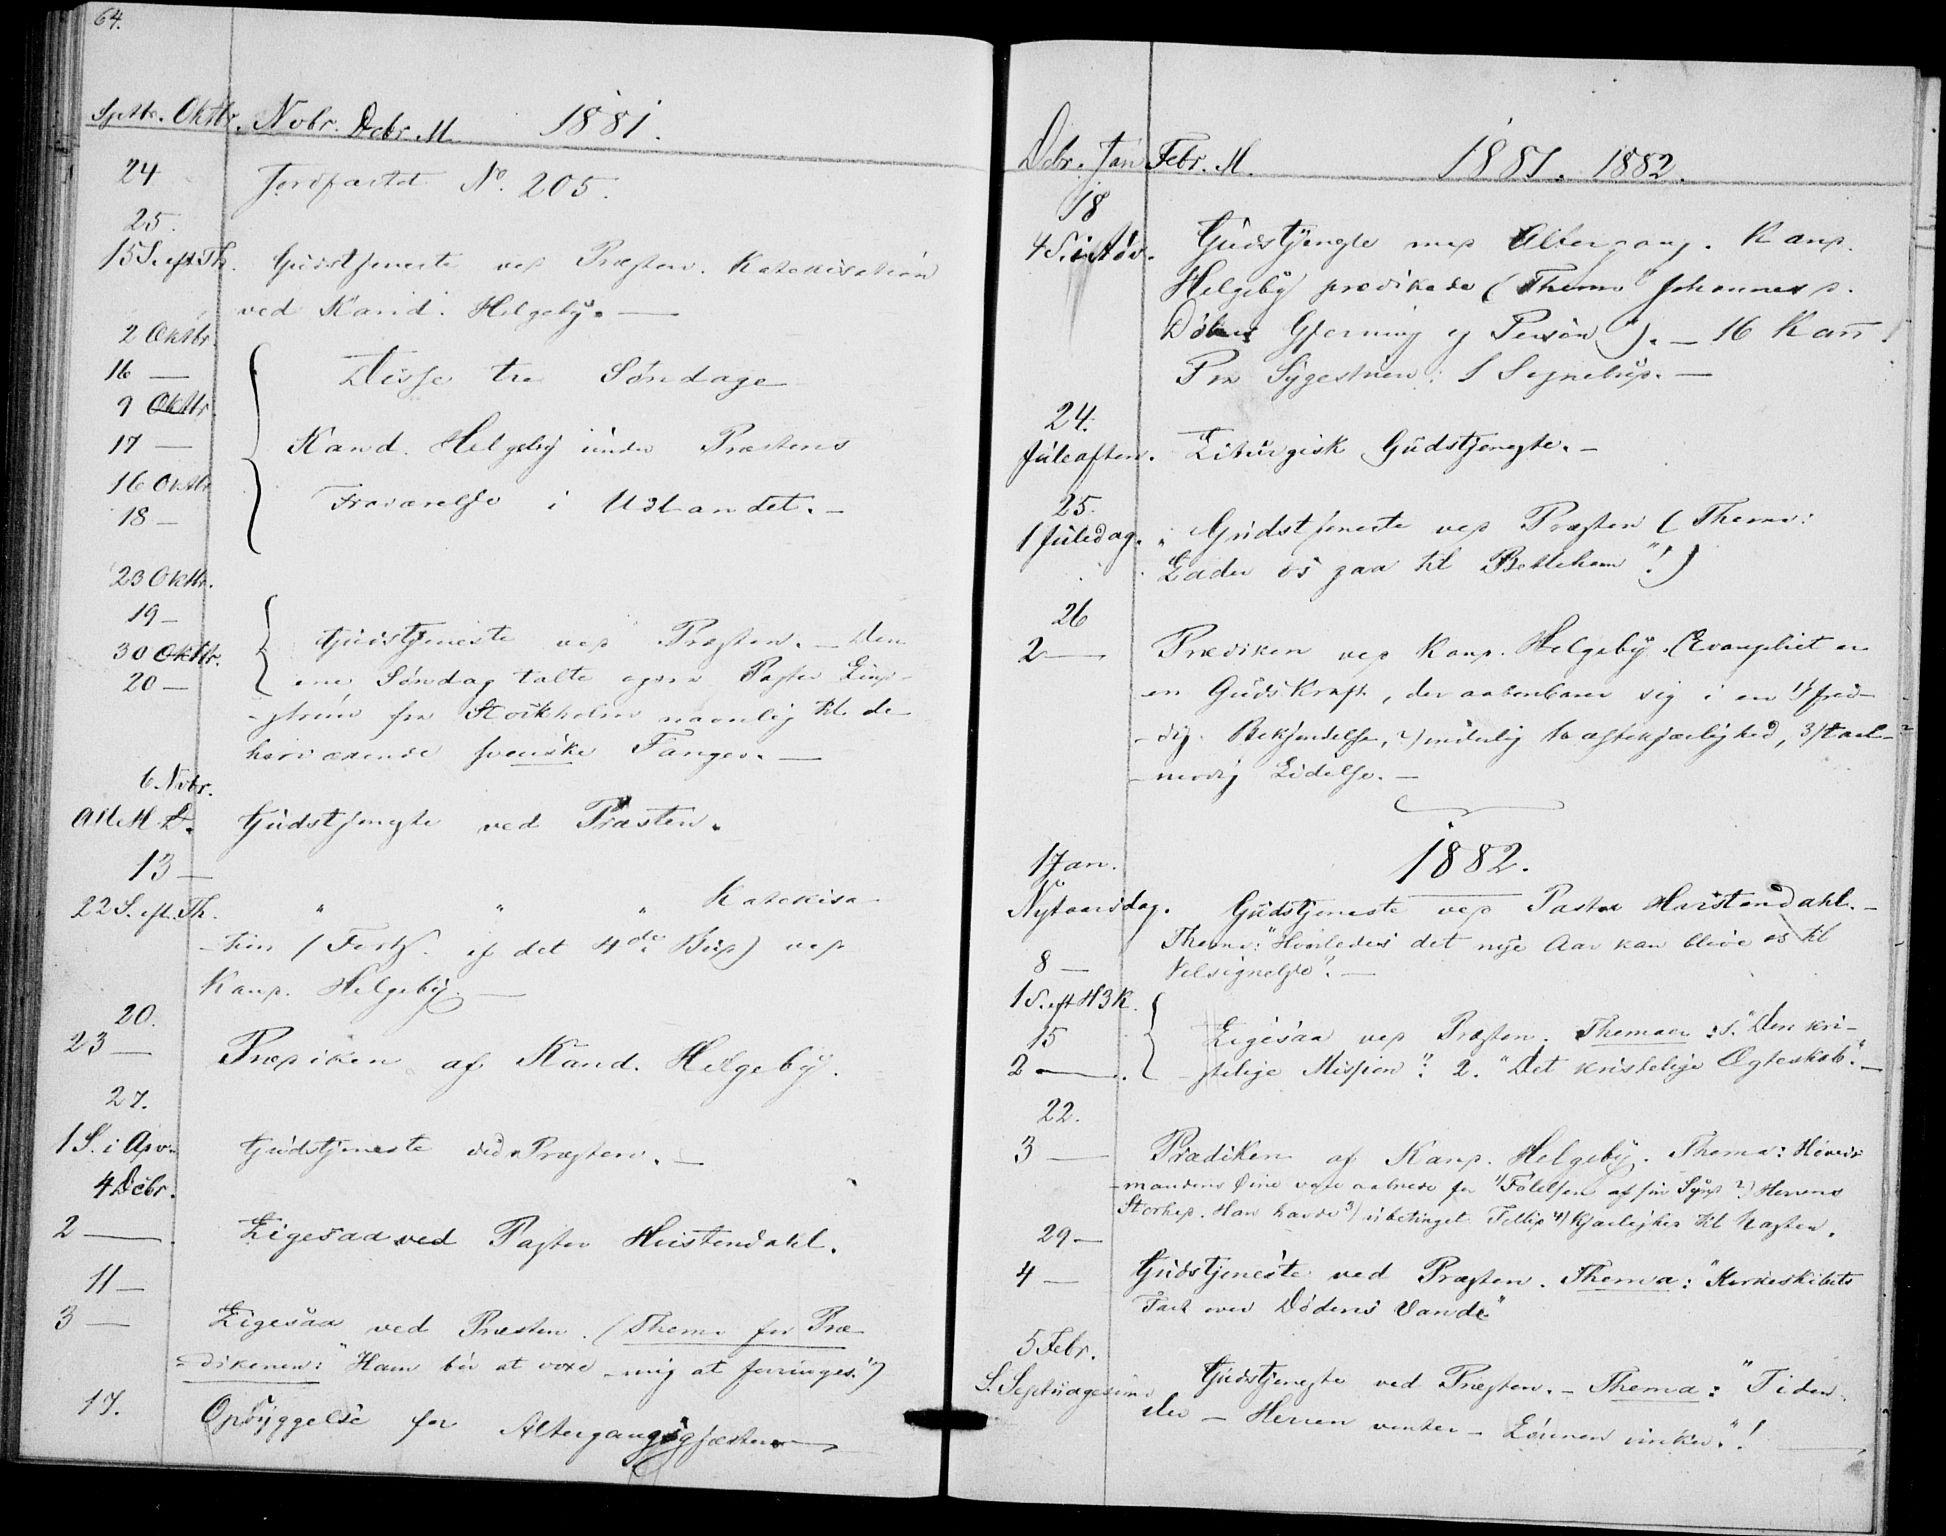 SAO, Akershus festnings slaveri Kirkebøker, F/Fa/L0002: Ministerialbok nr. 2, 1852-1883, s. 64